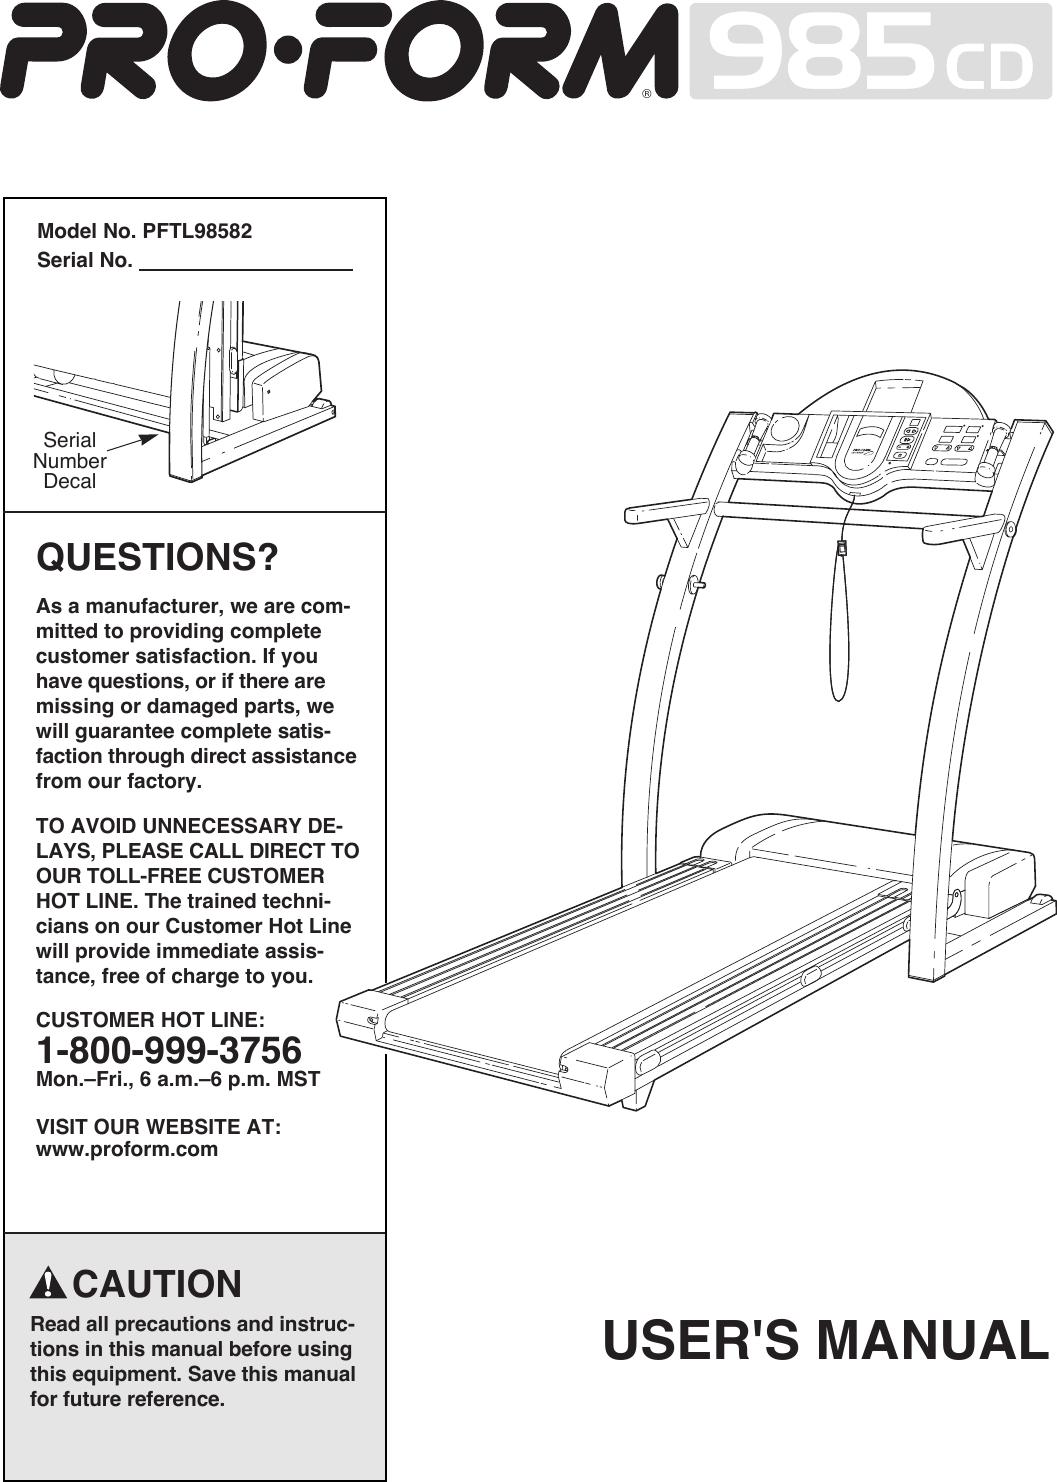 Proform Pftl98582 985Cd Treadmill Users Manual *PFTL98582